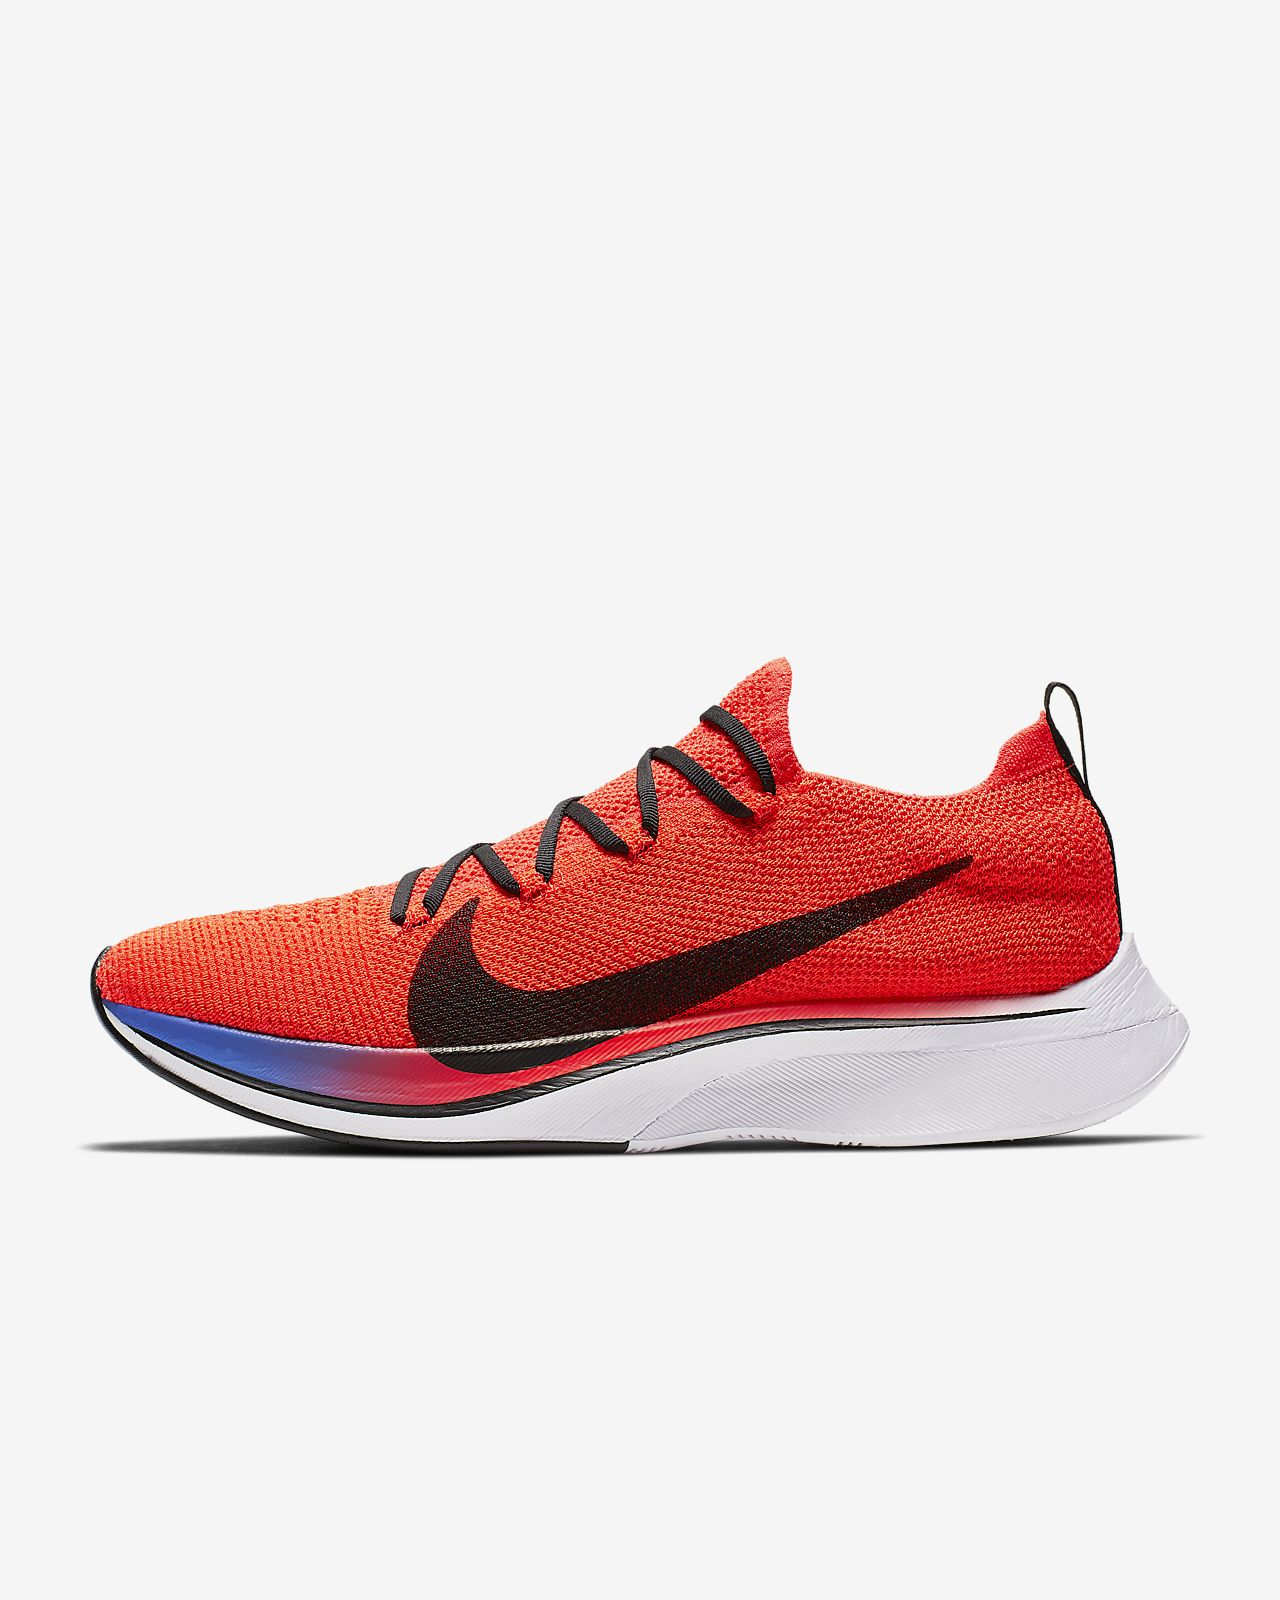 Scarpa da running Nike Vaporfly 4% Flyknit